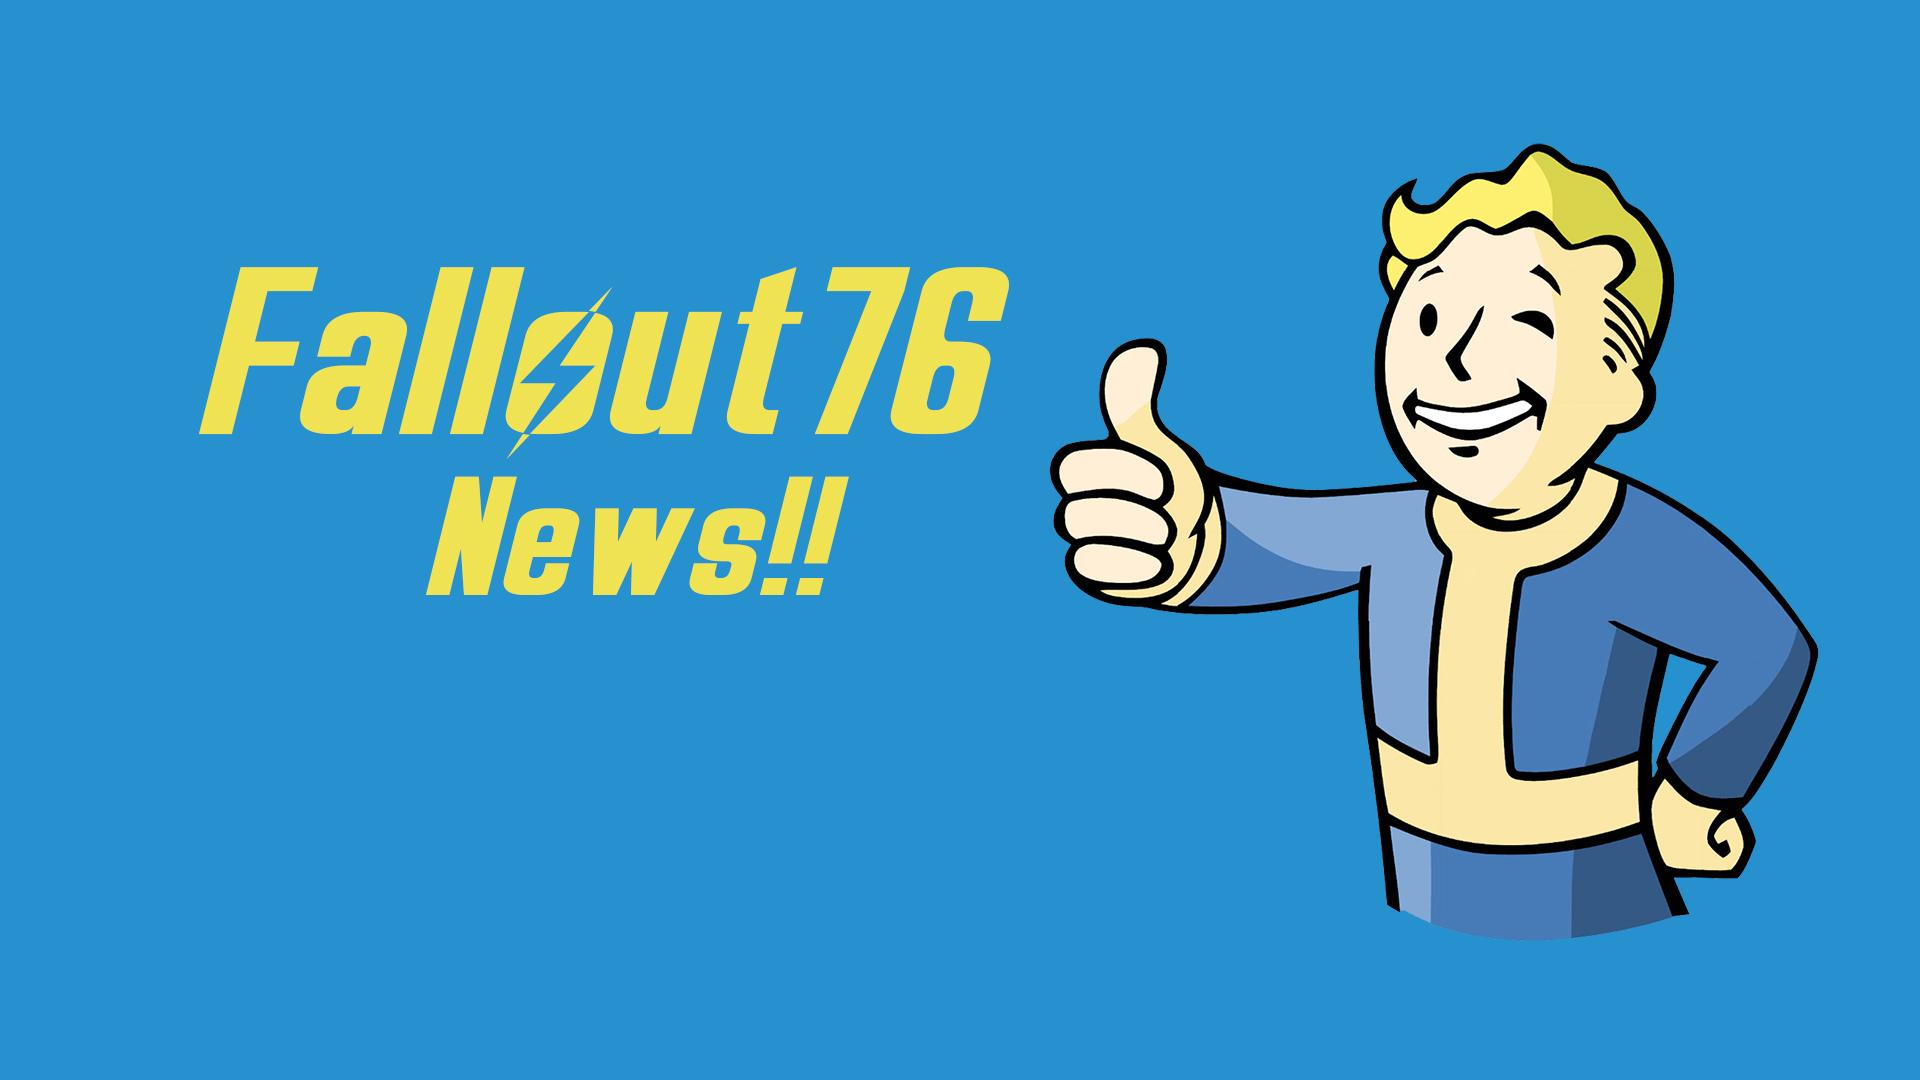 《Fallout76 B.E.T.A》アップデートのお知らせとその内容